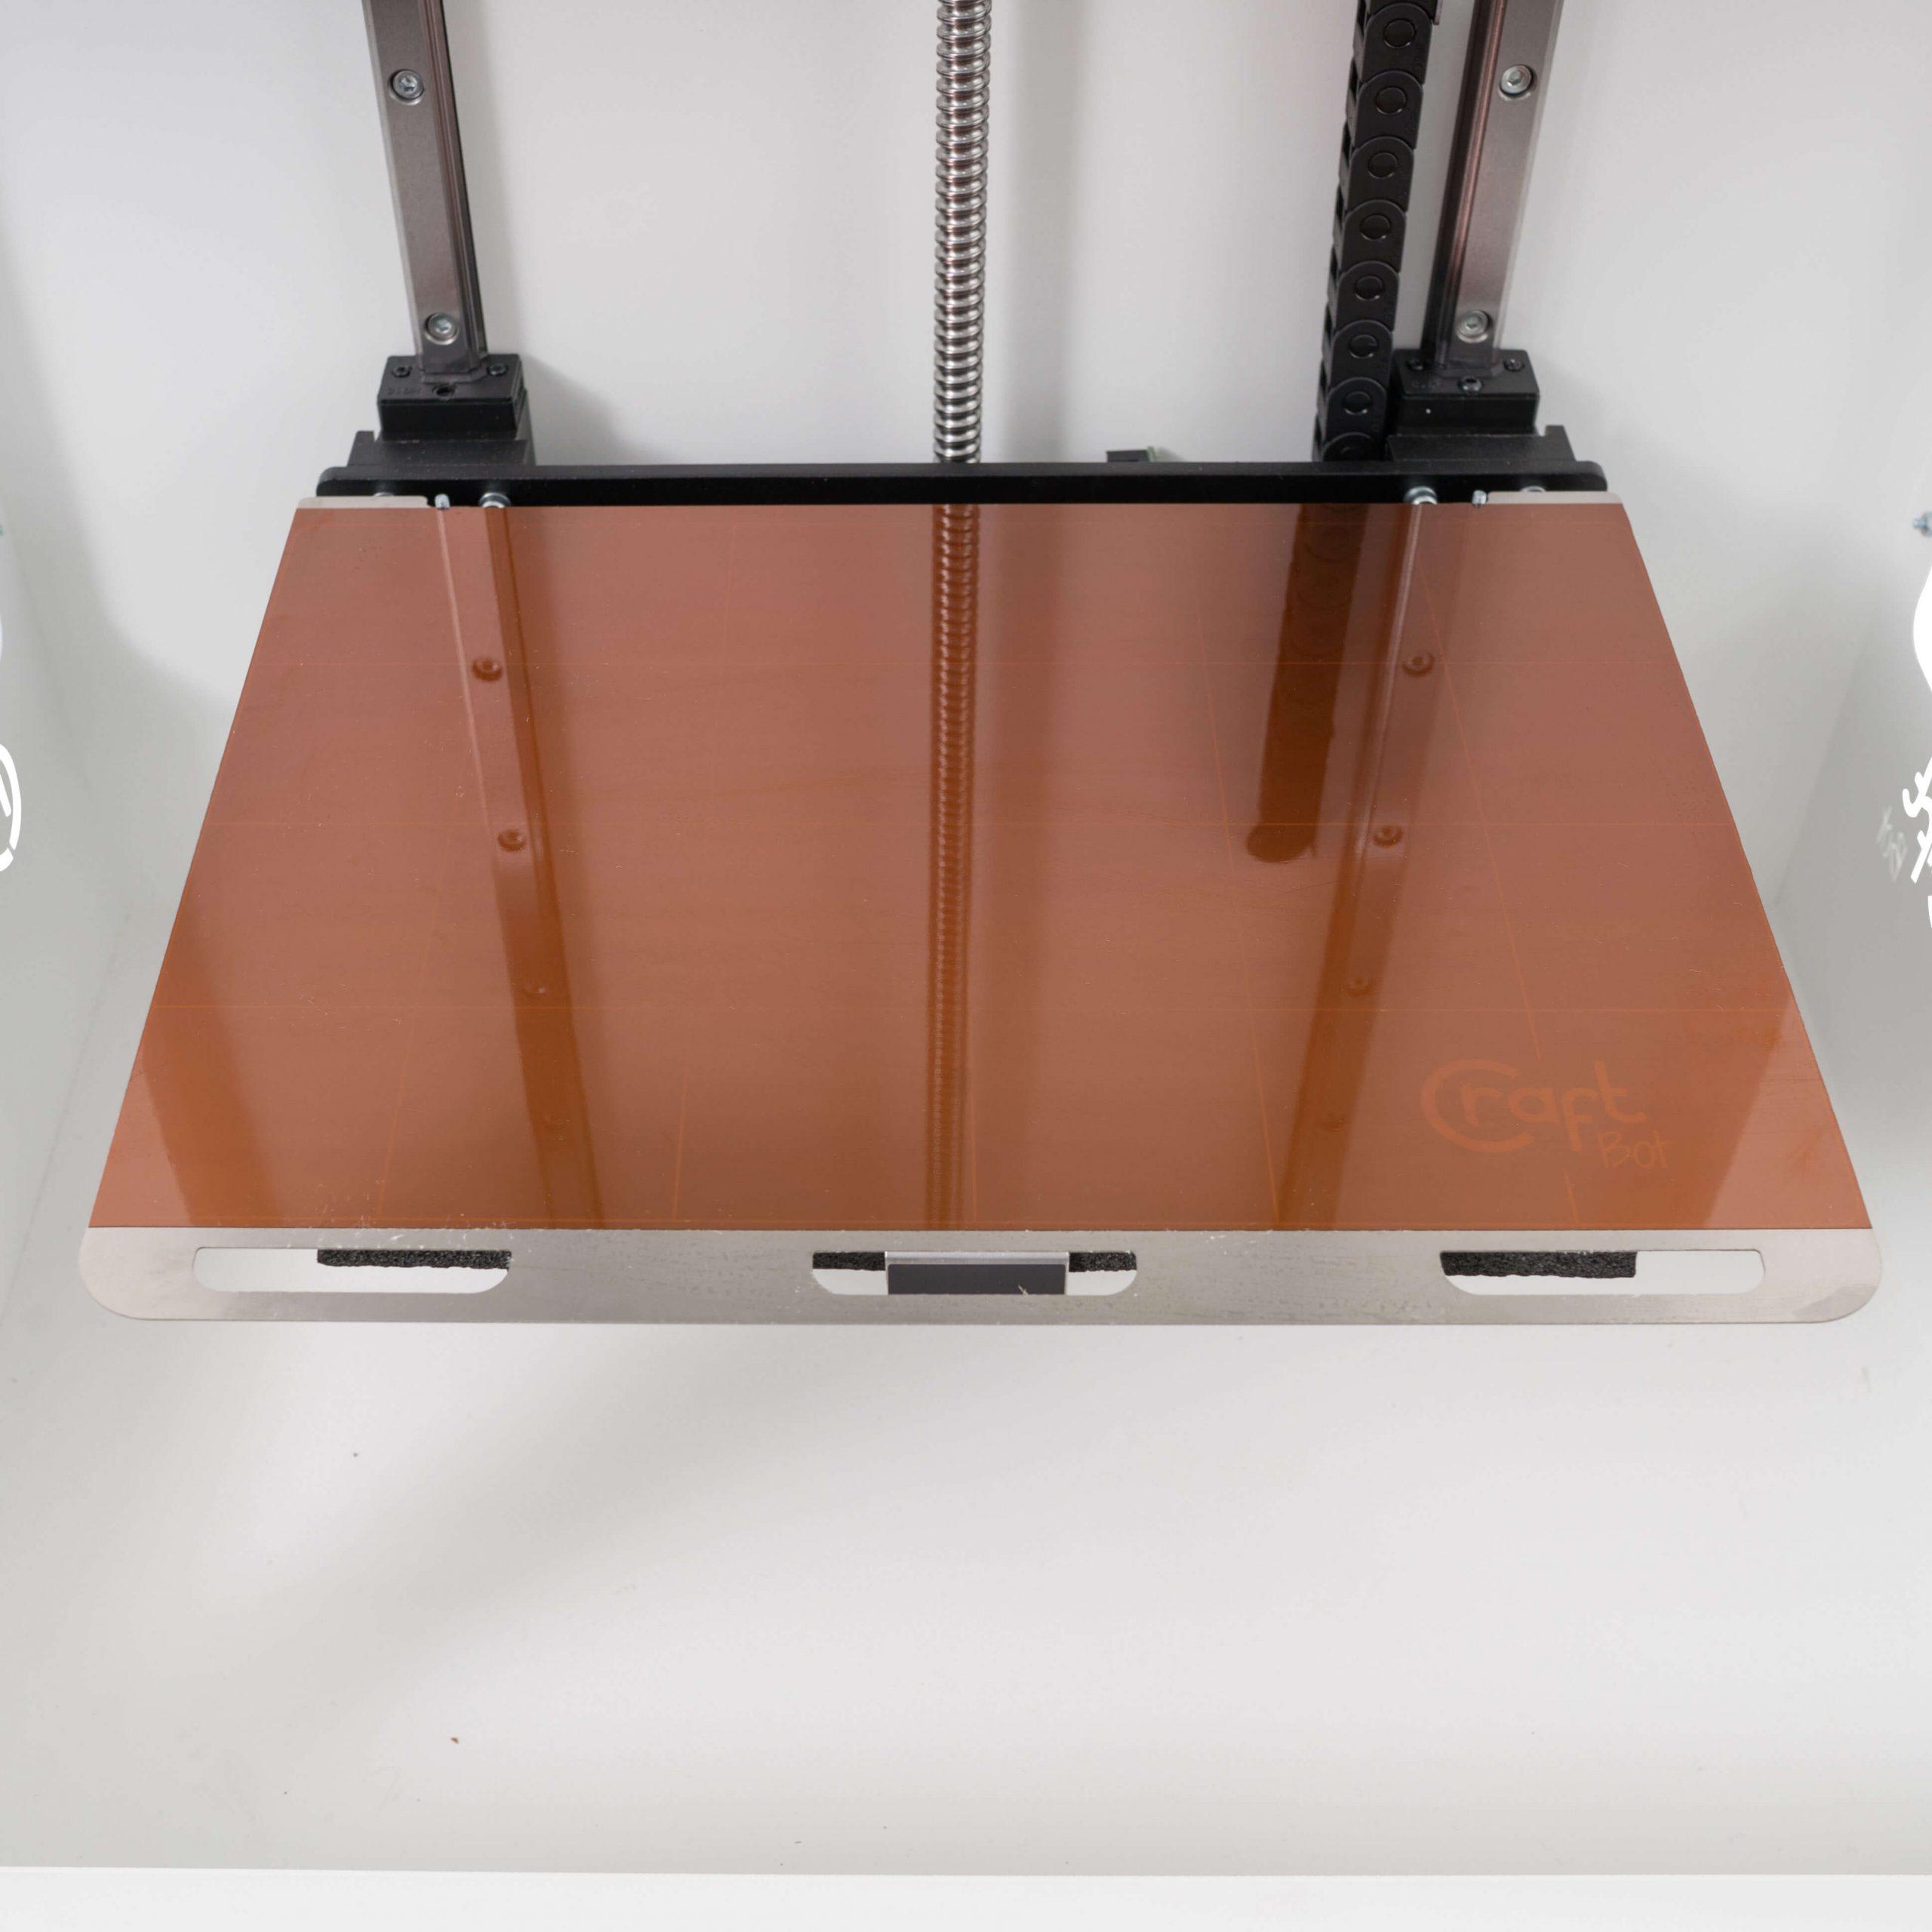 craftbot-flow-xl-3d-drucker-druckbett-wien.jpg